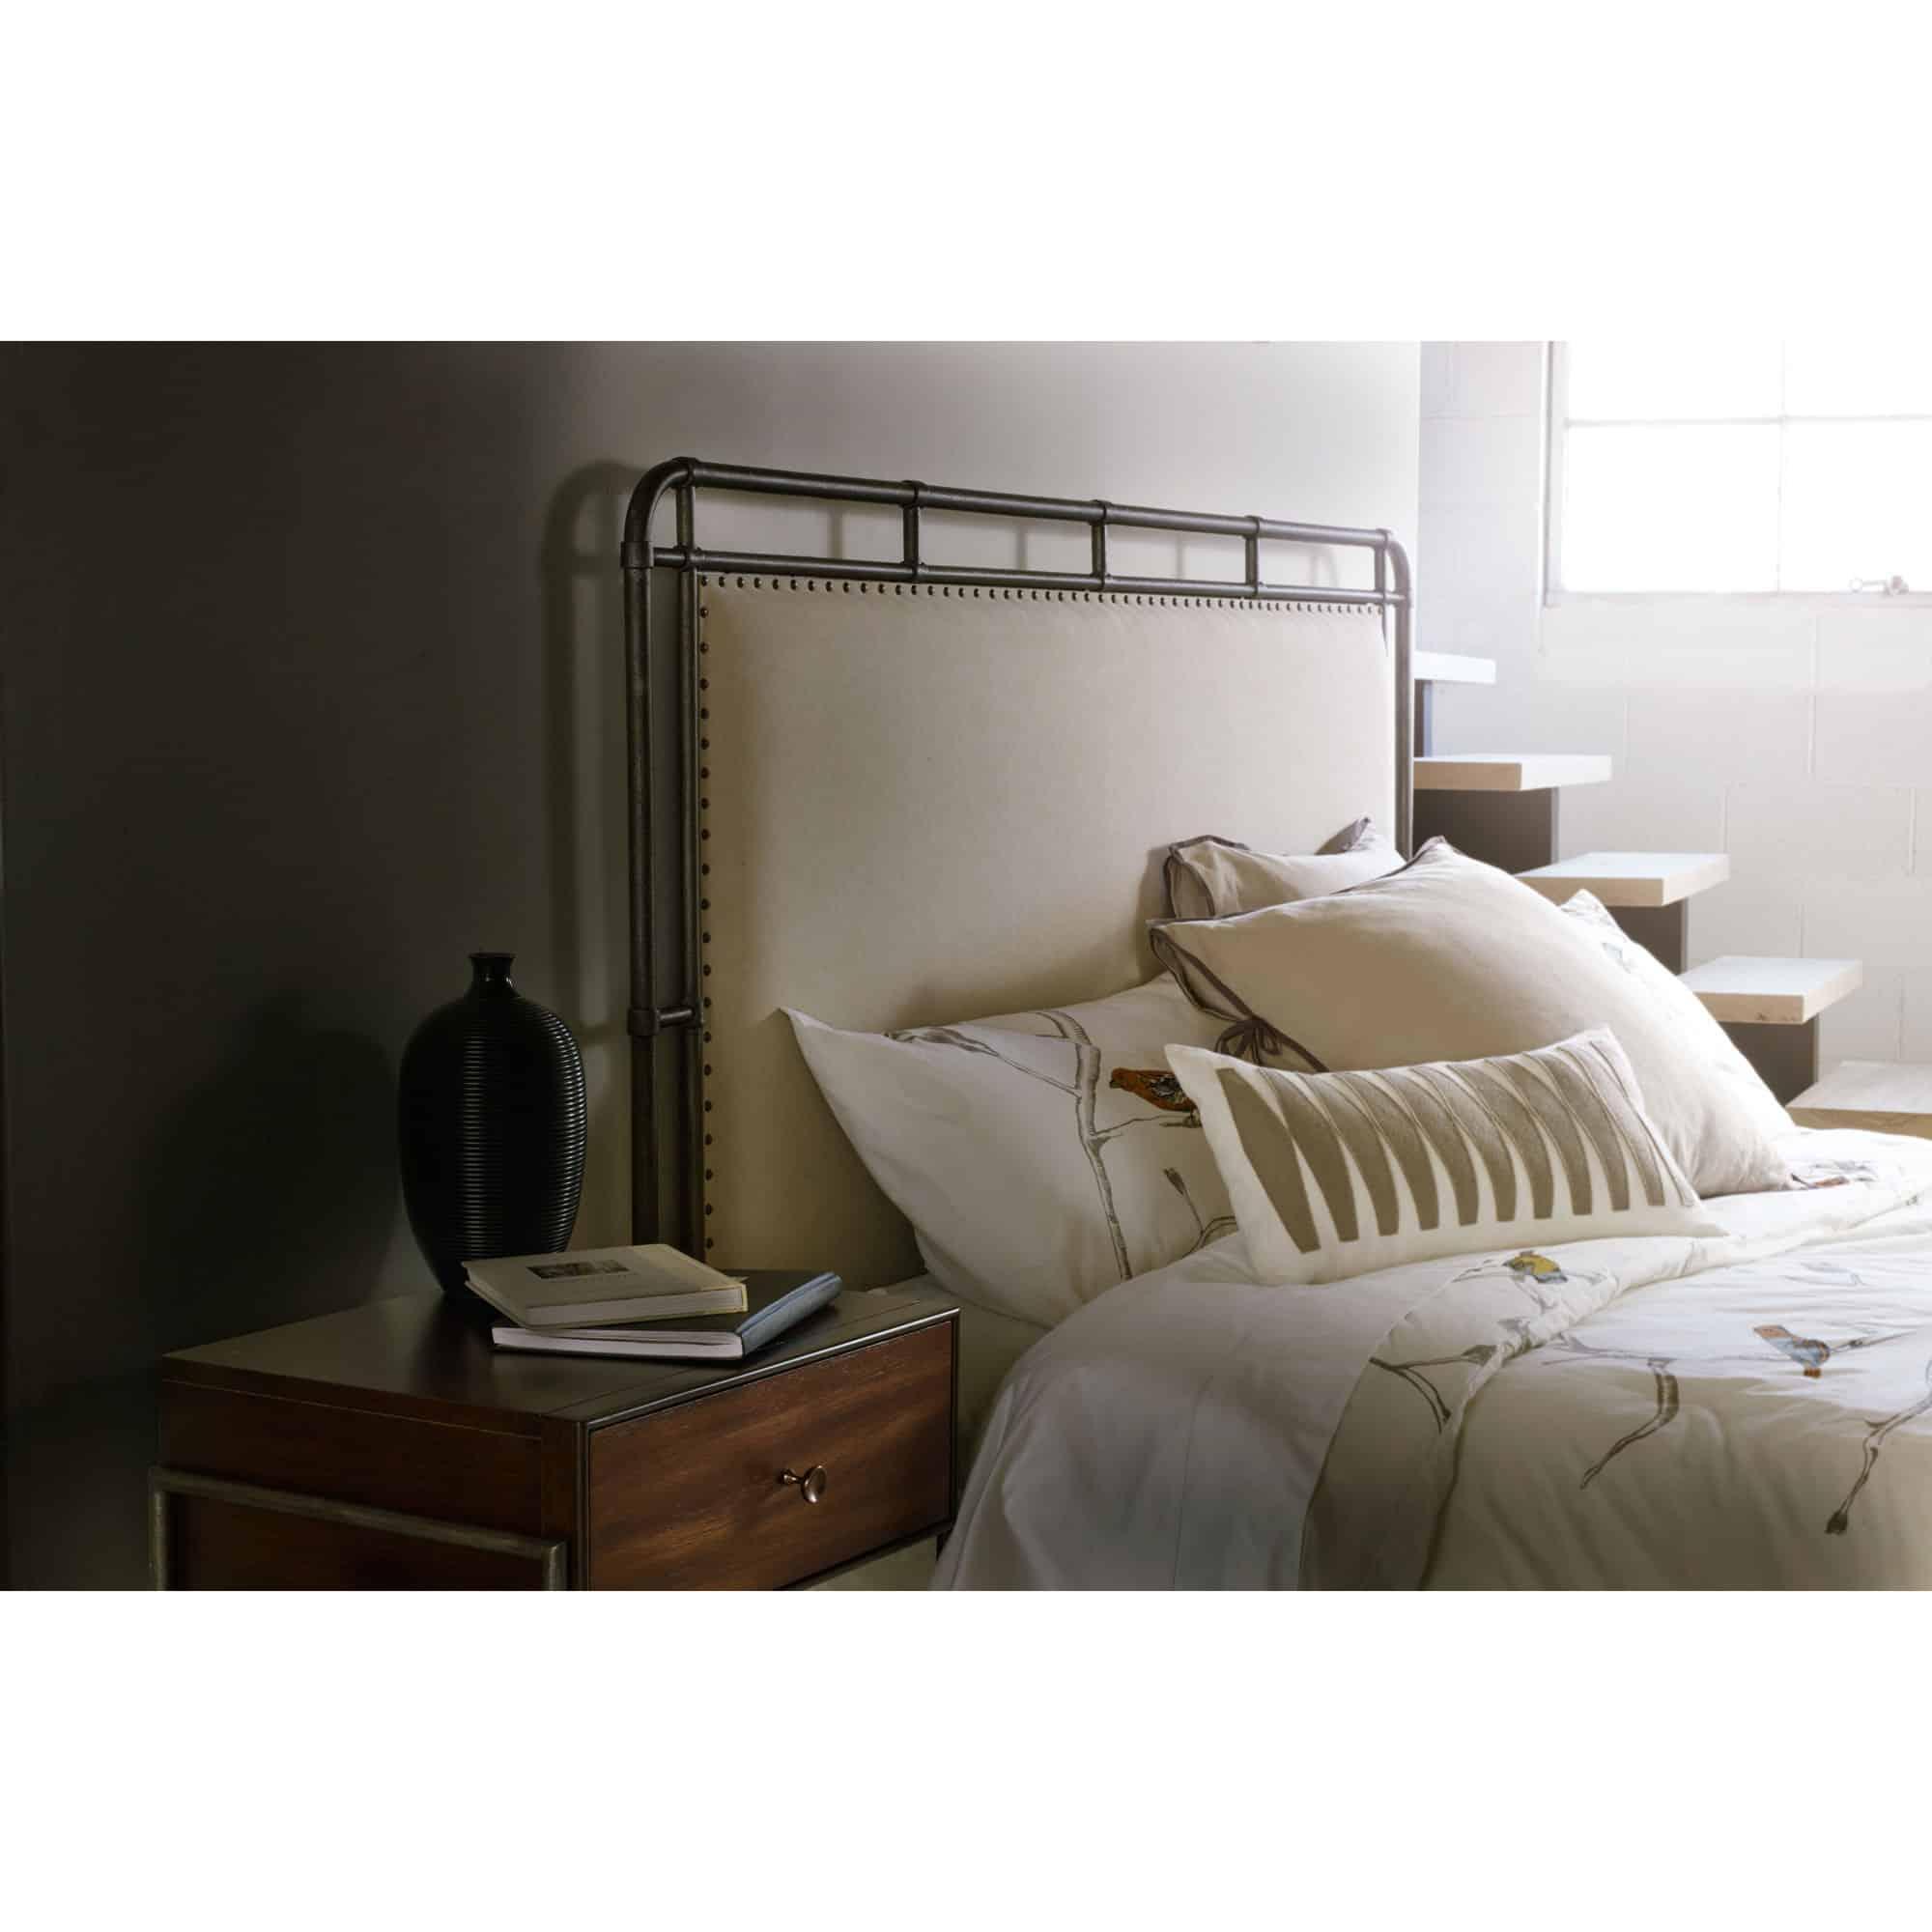 mar office hooker bedroom living furniture